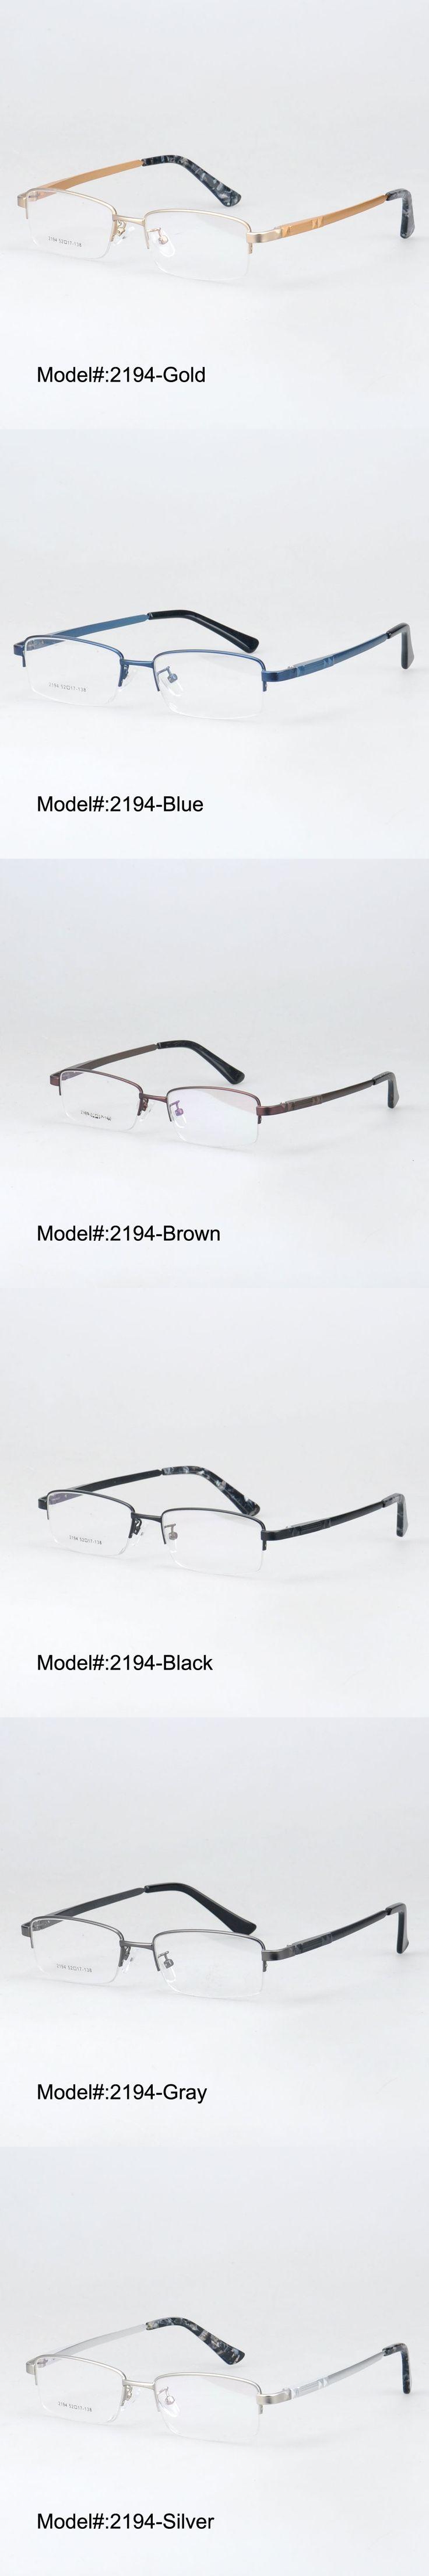 MY DOLI 2194 classical half rim high quality alloy temple eyewear glasses spectacles myopia optical frame eyewear eyeglasses